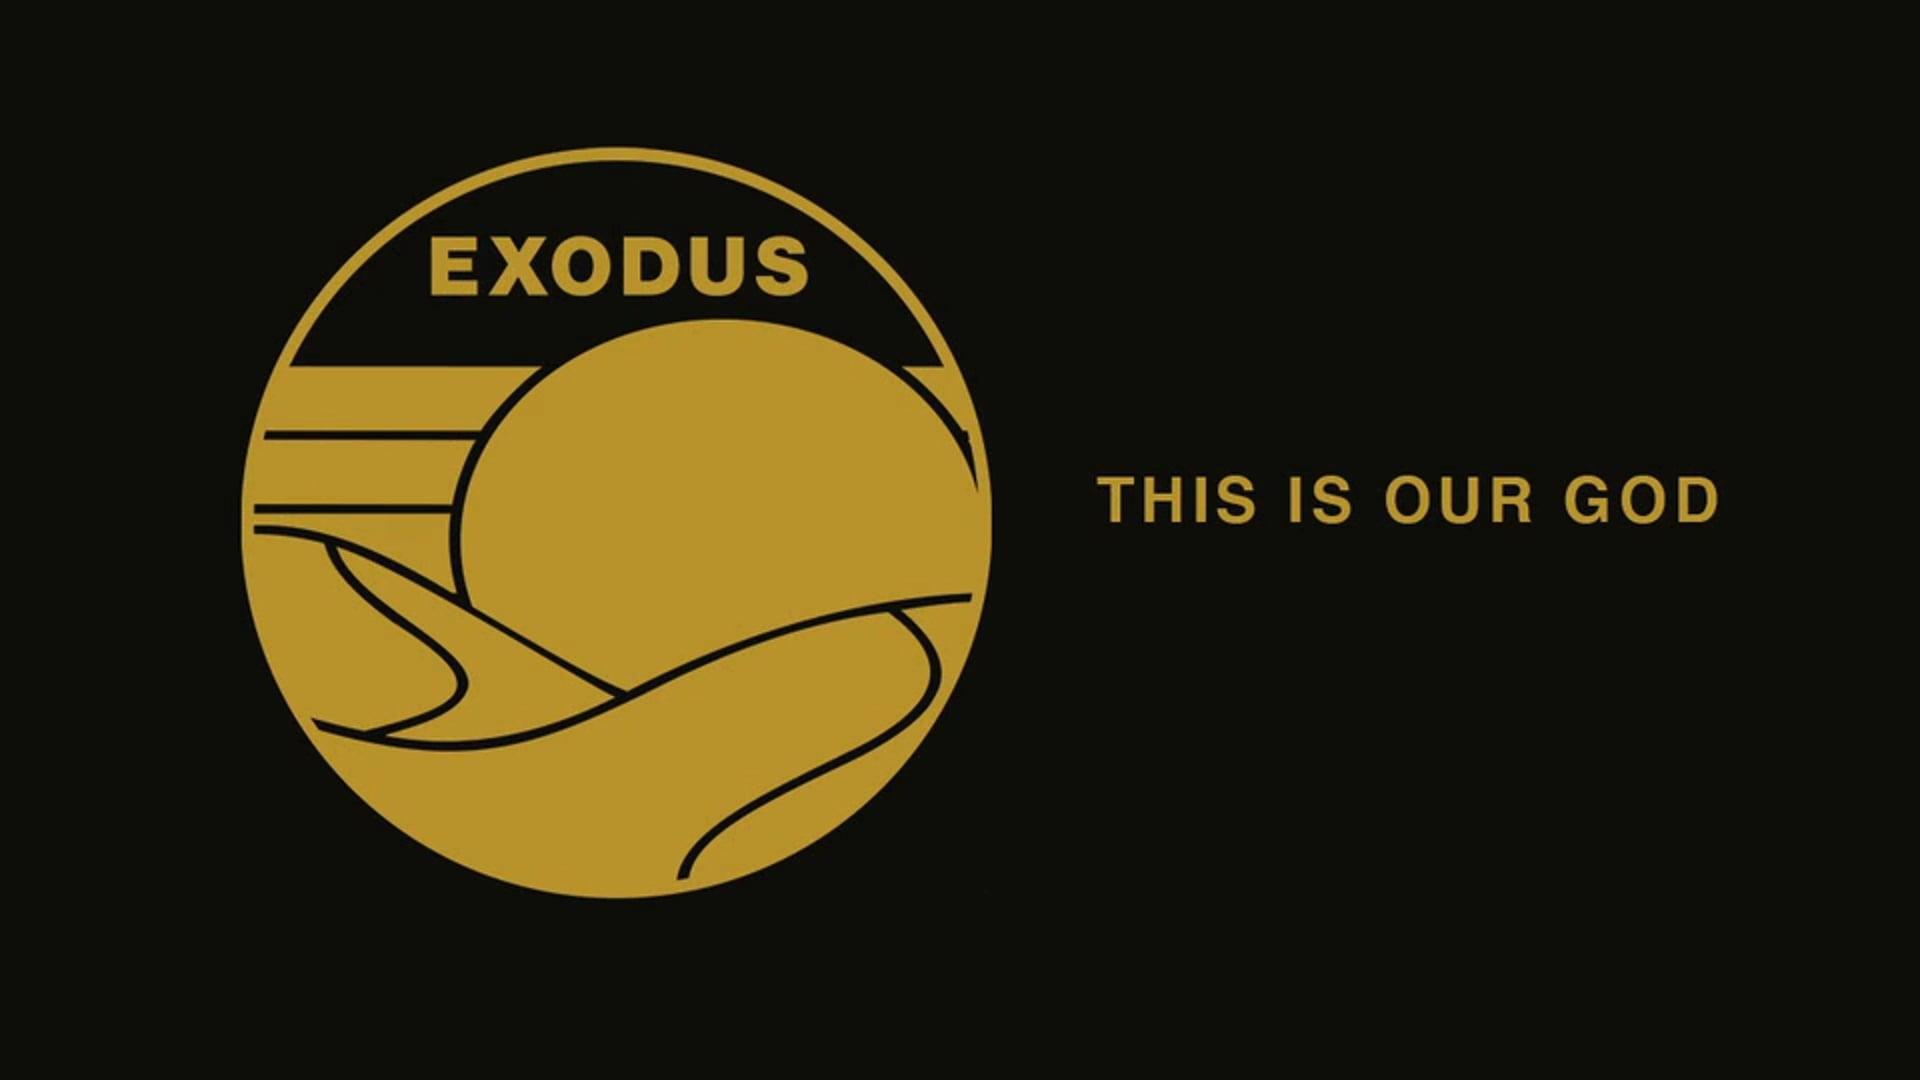 Week 8: God Leads You | Exodus 13:17-22